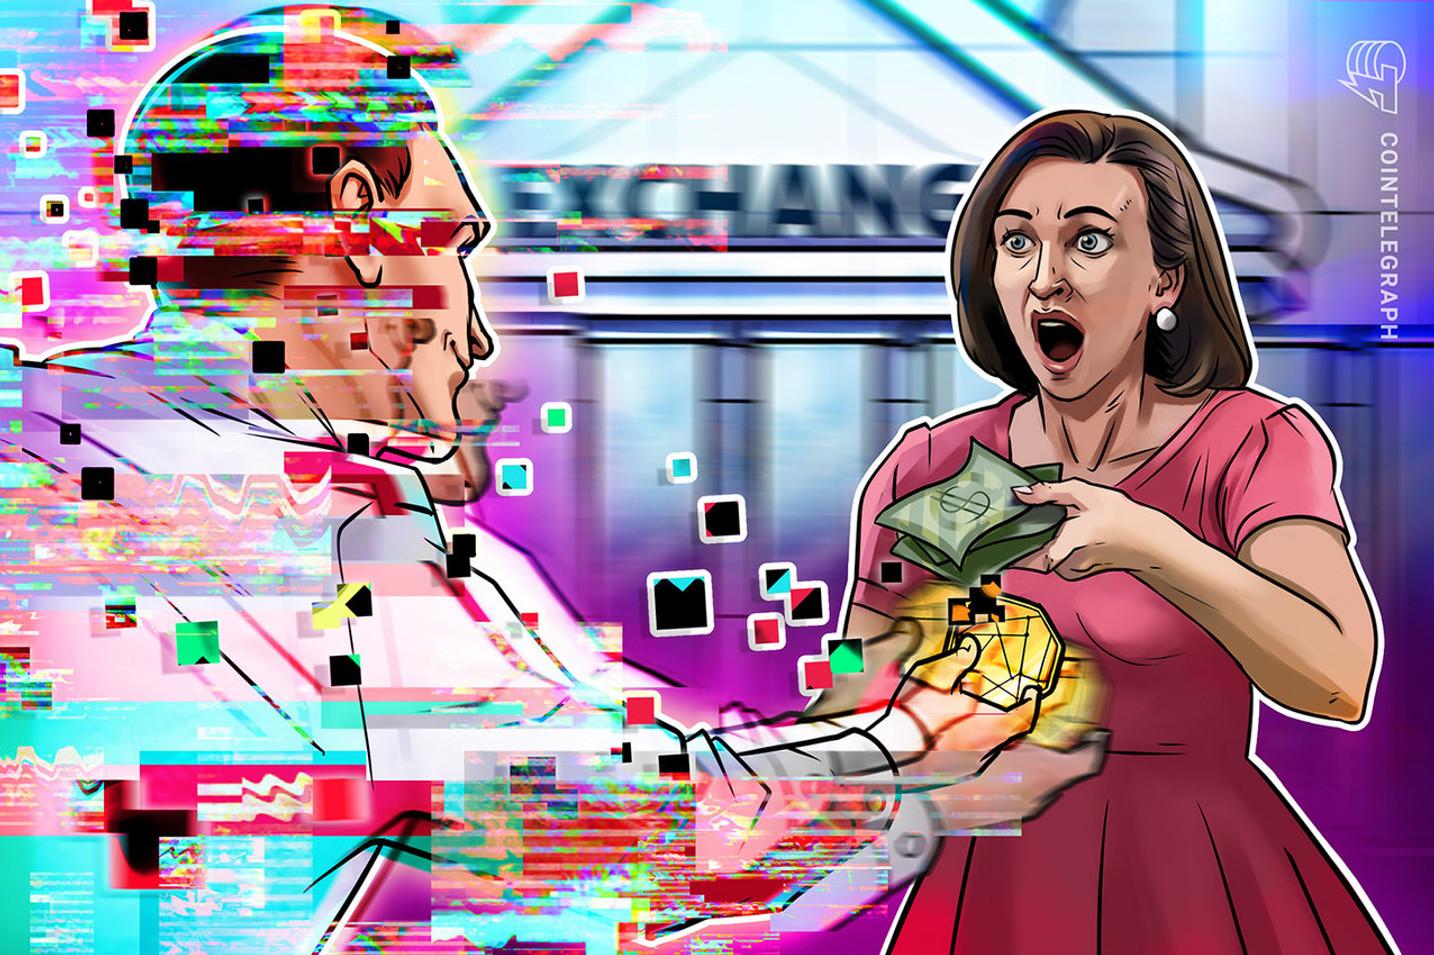 Chainalysis, o novo unicórnio cripto criticado por se envolver em 'corrida armamentista contra a privacidade'